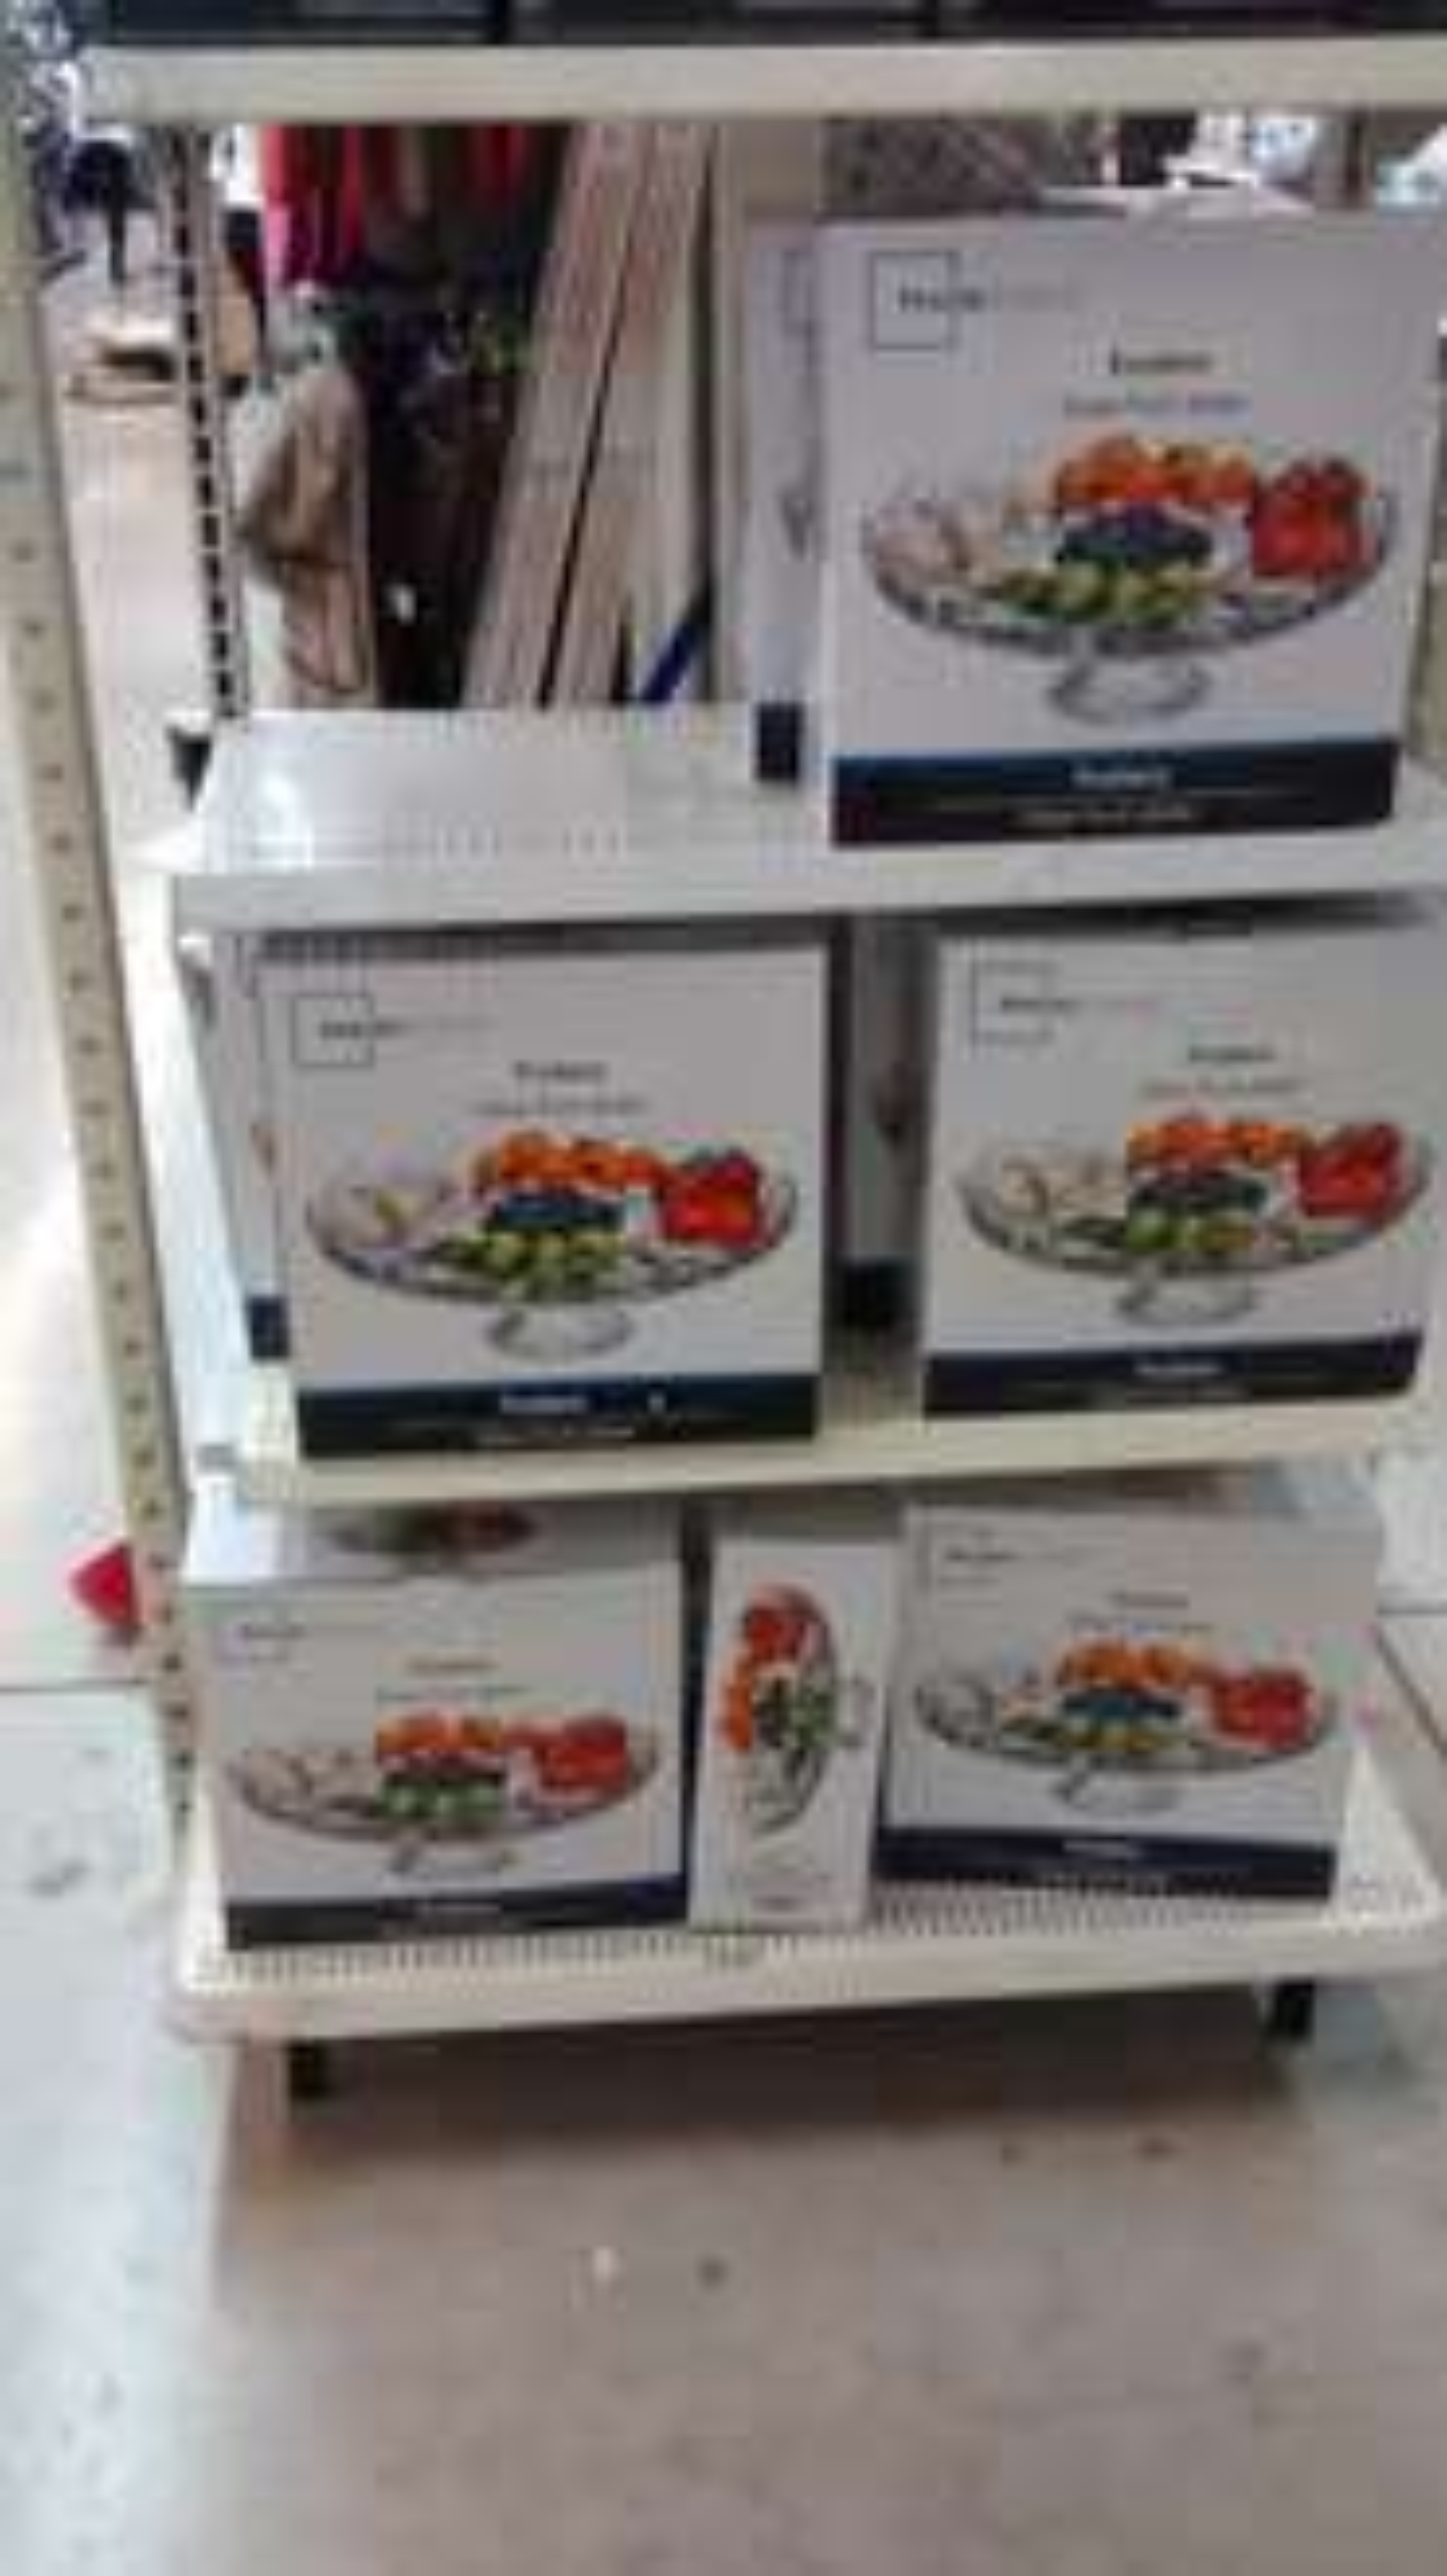 Bodega Aurrerá: Frutero con base de cristal $49, tubo de galletas príncipe 152grs $10